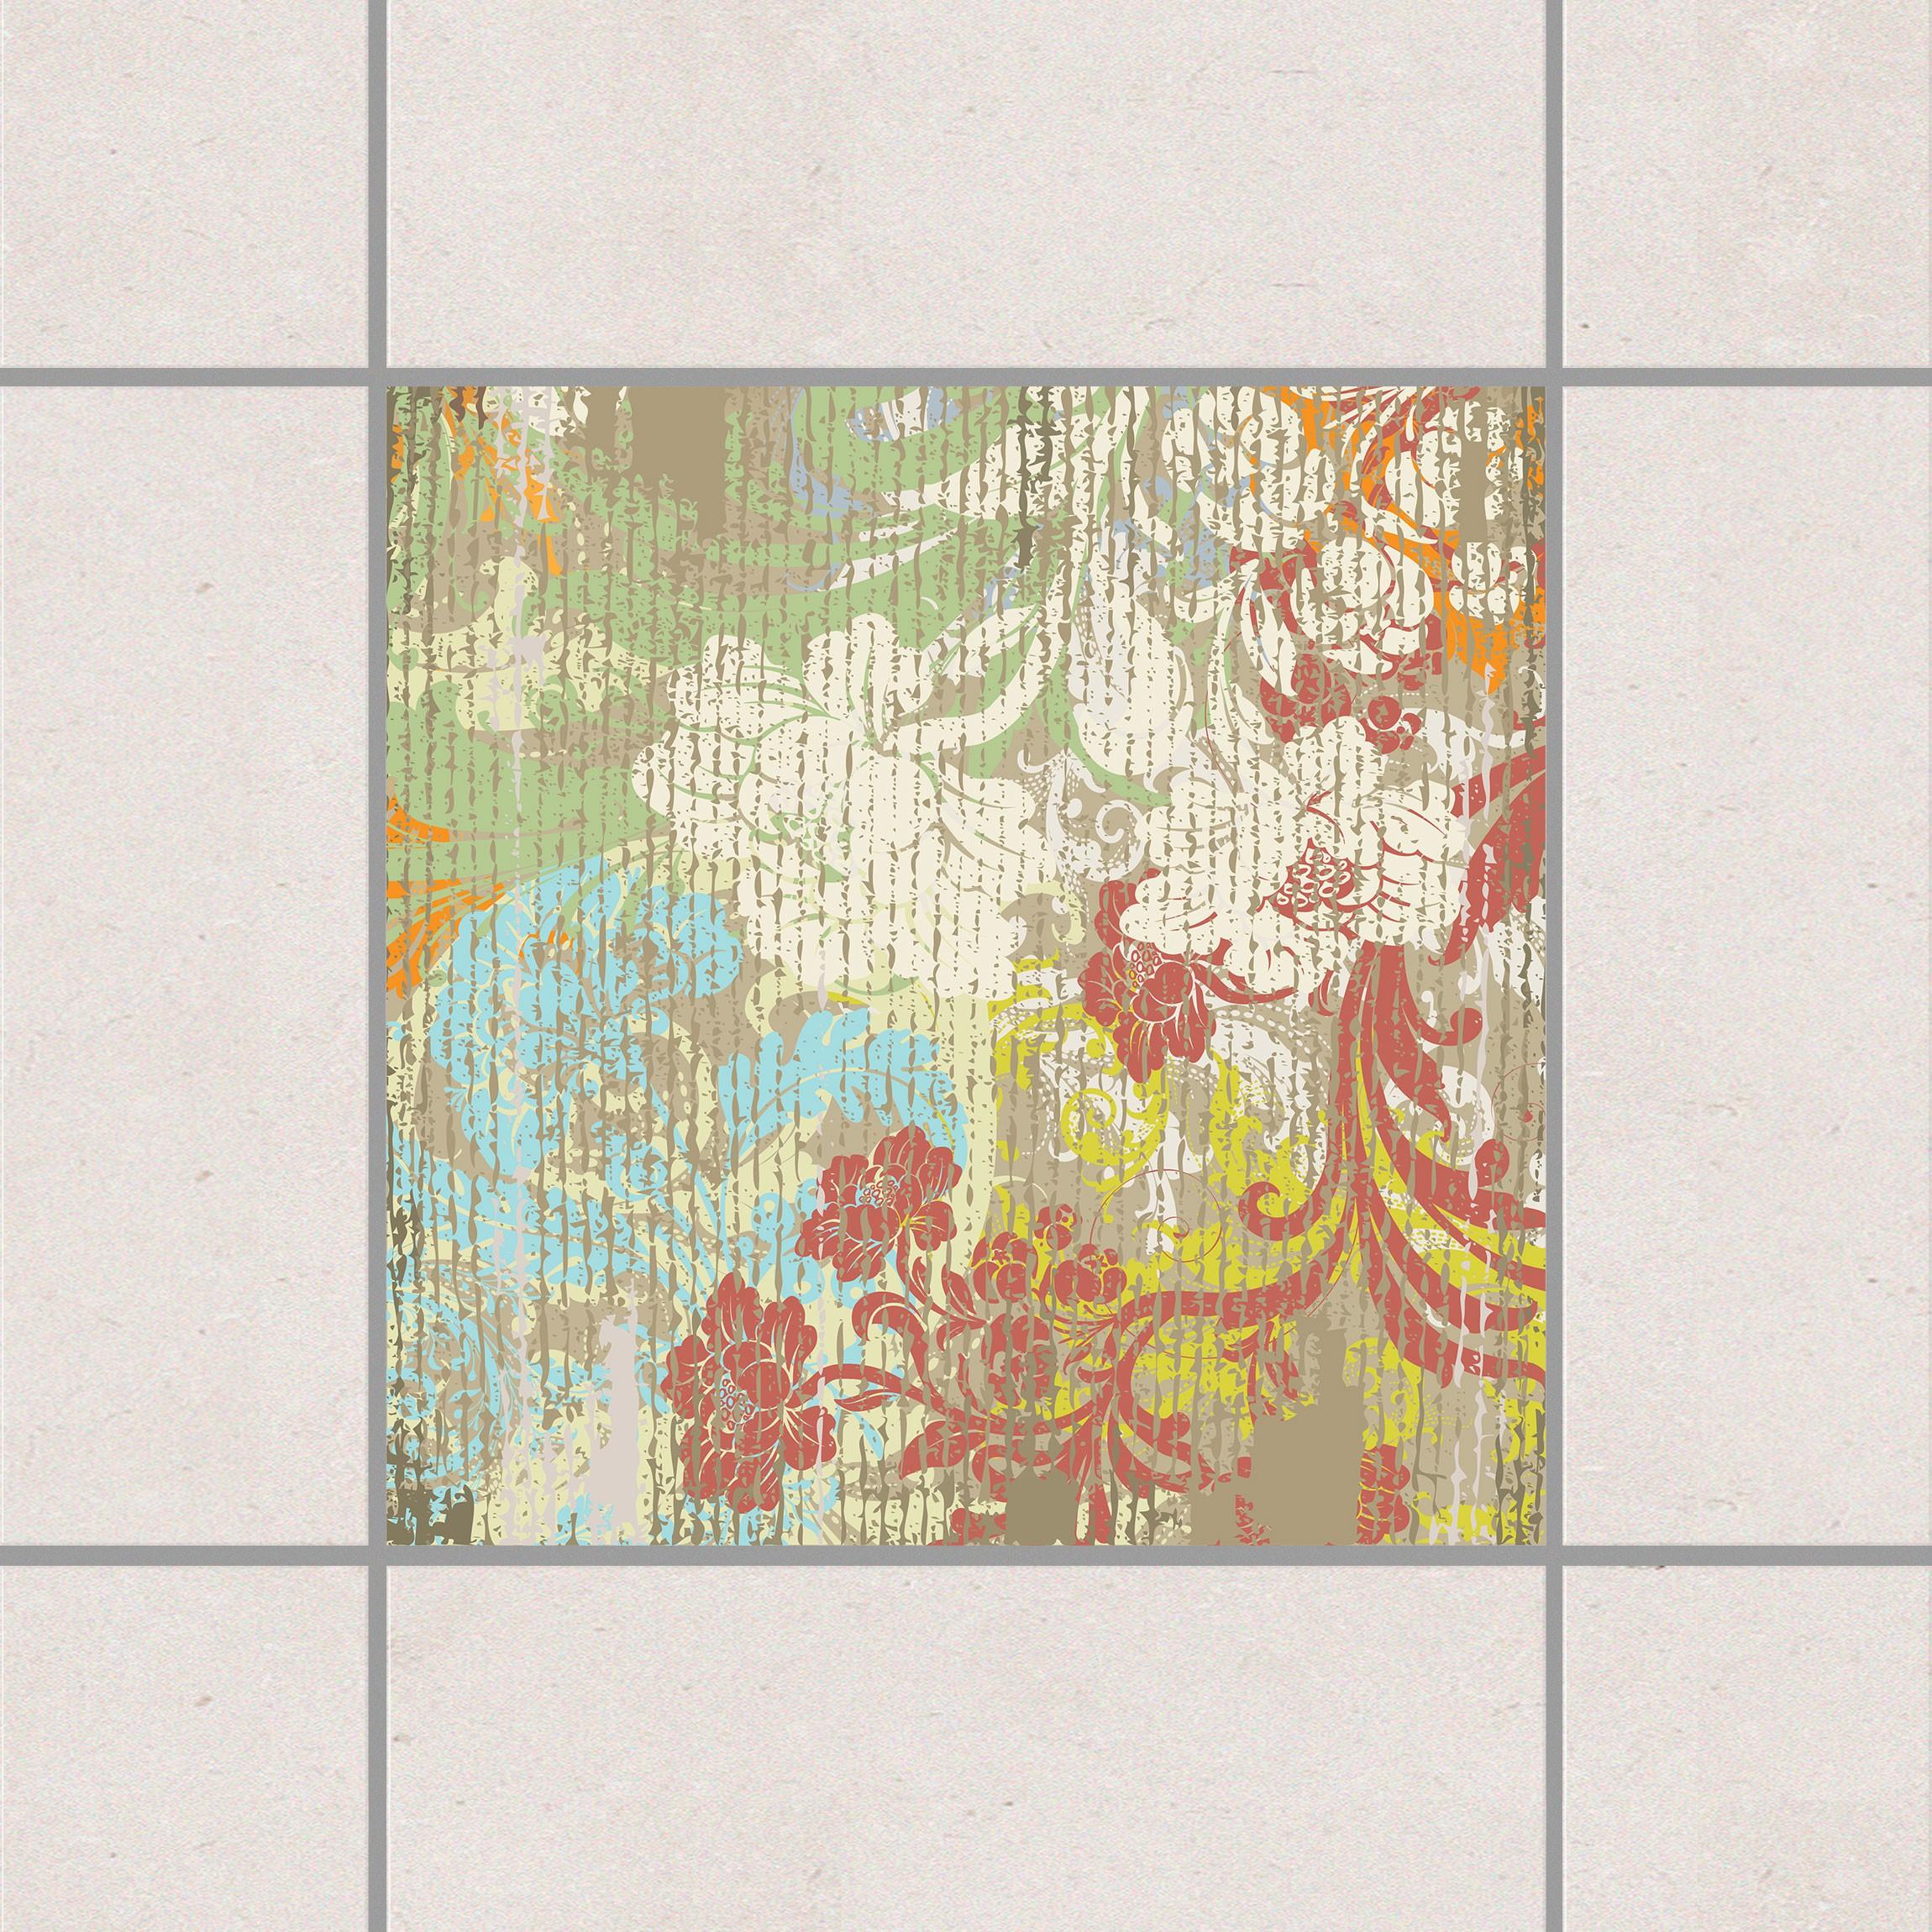 Fliesenaufkleber bl ten vergangener zeit 15x15 cm for Fliesensticker 15x15